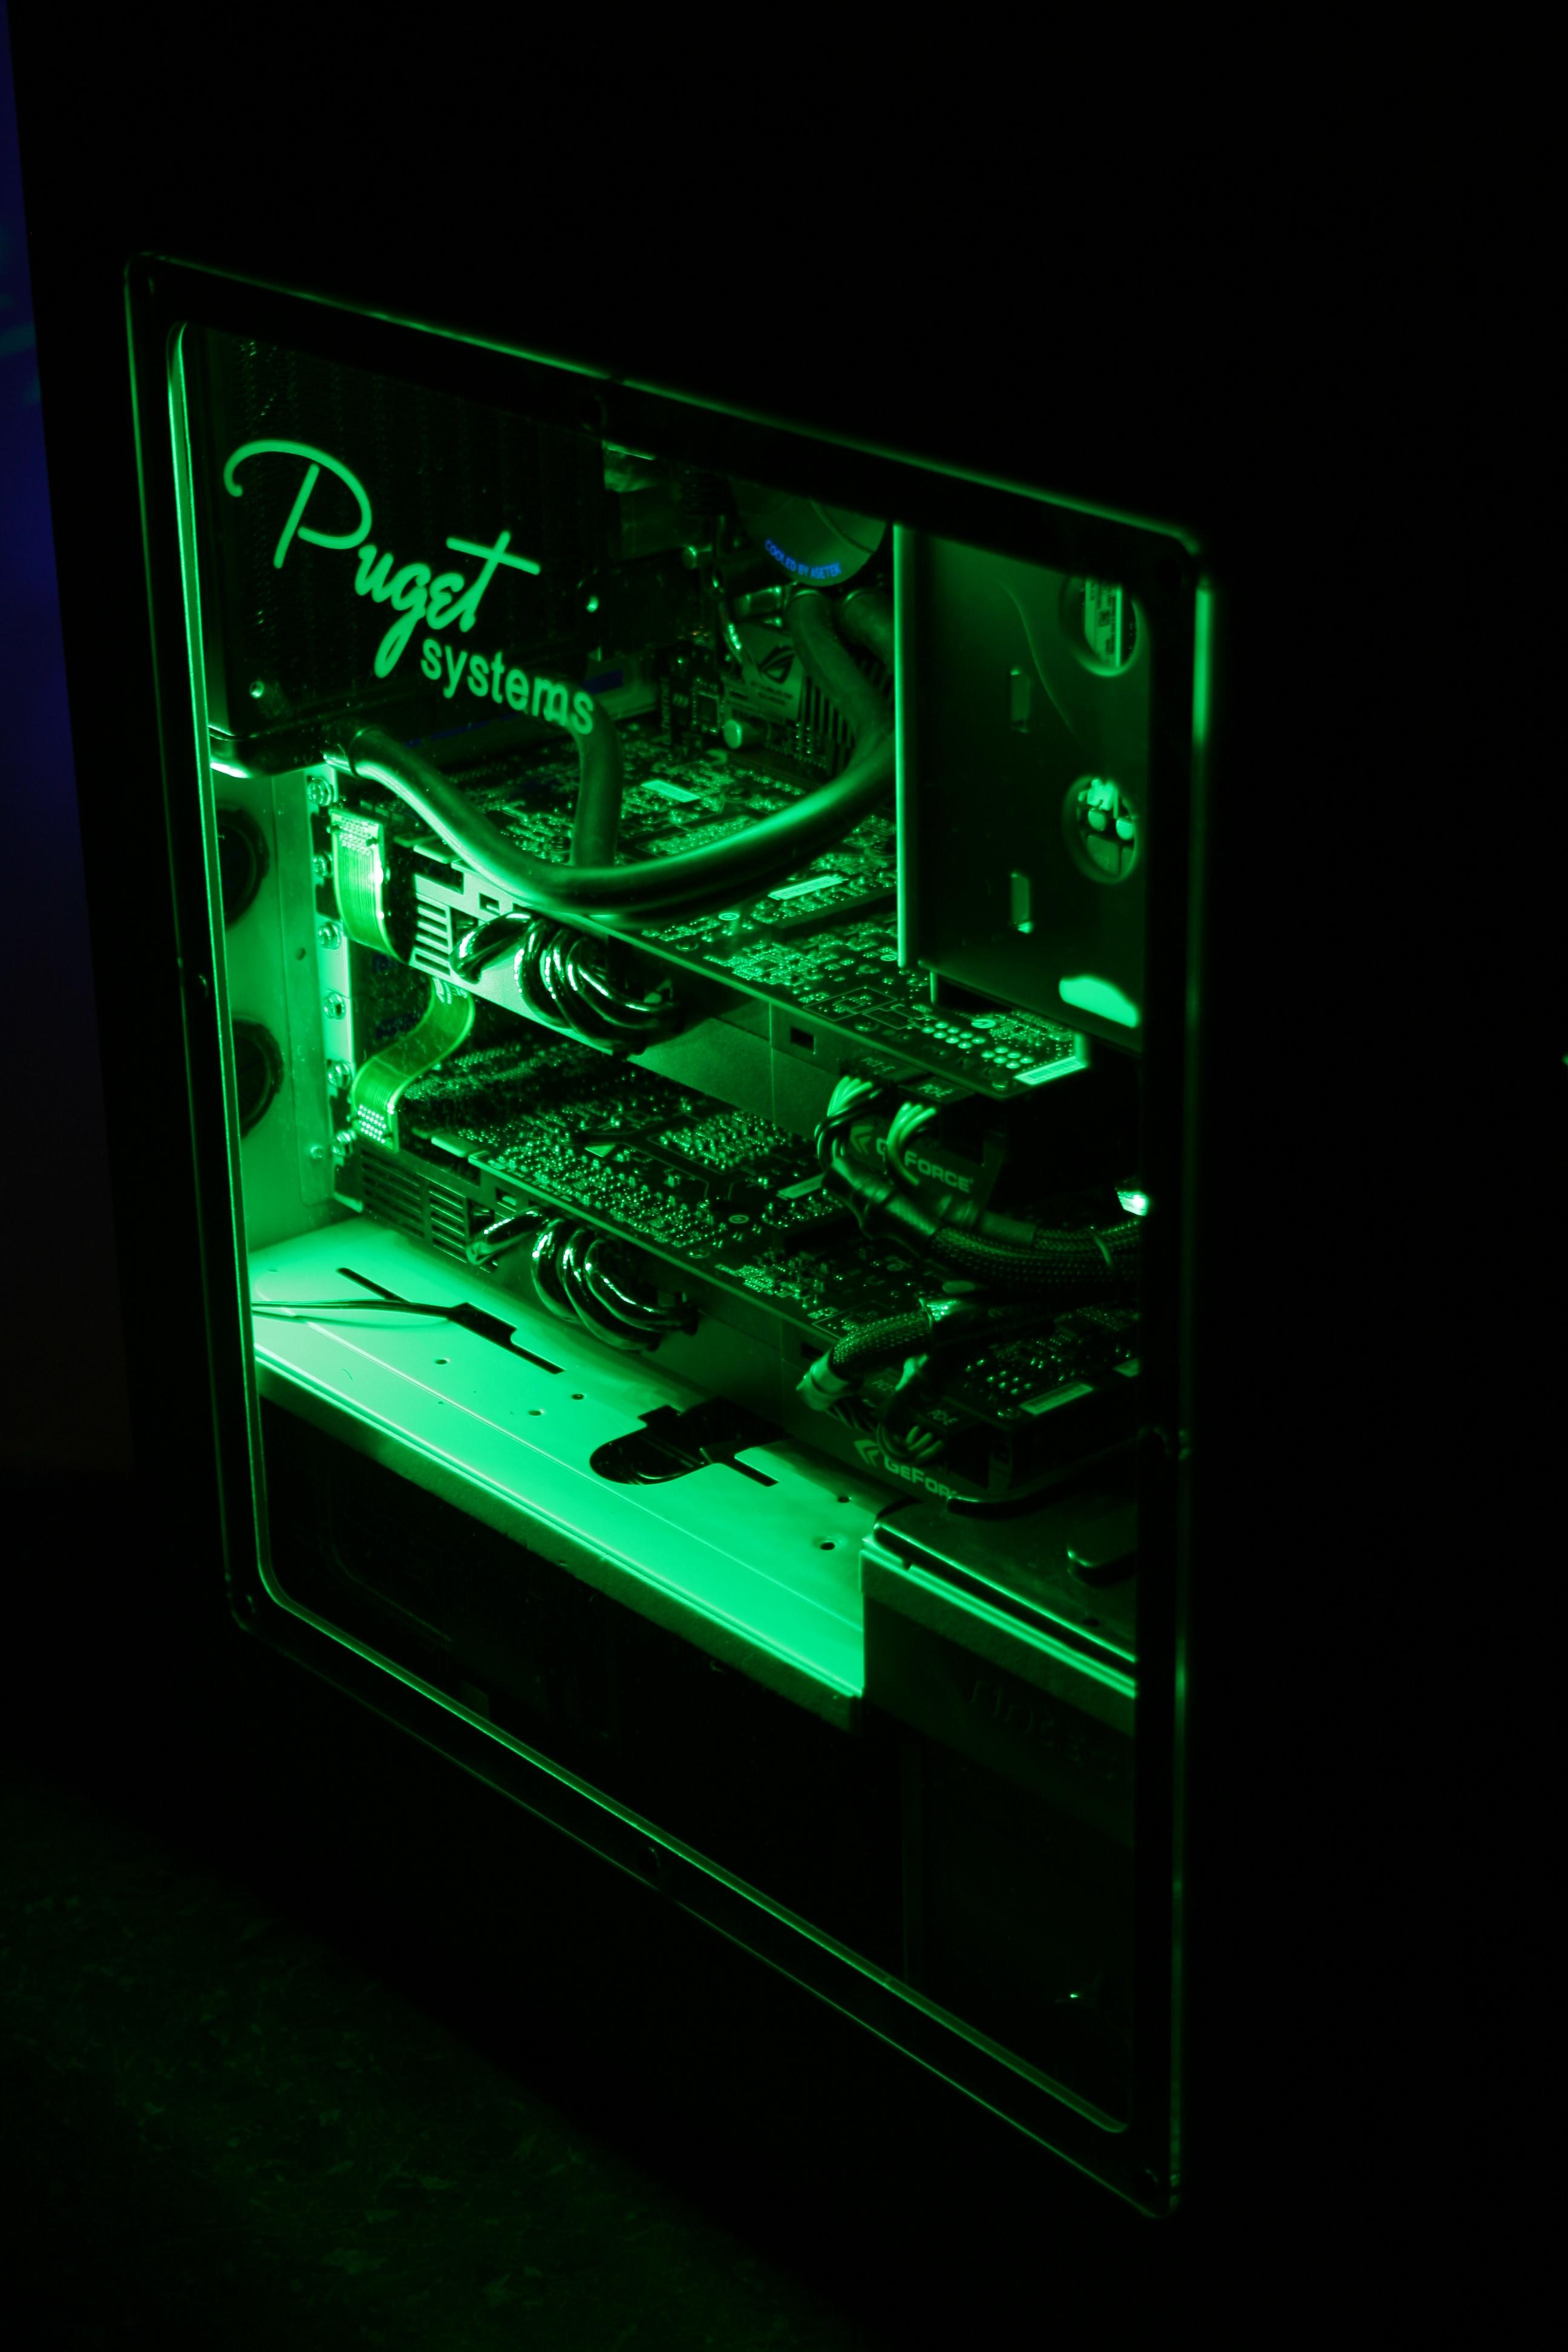 pin light lights pinterest us led indicator red green scartclub lighting